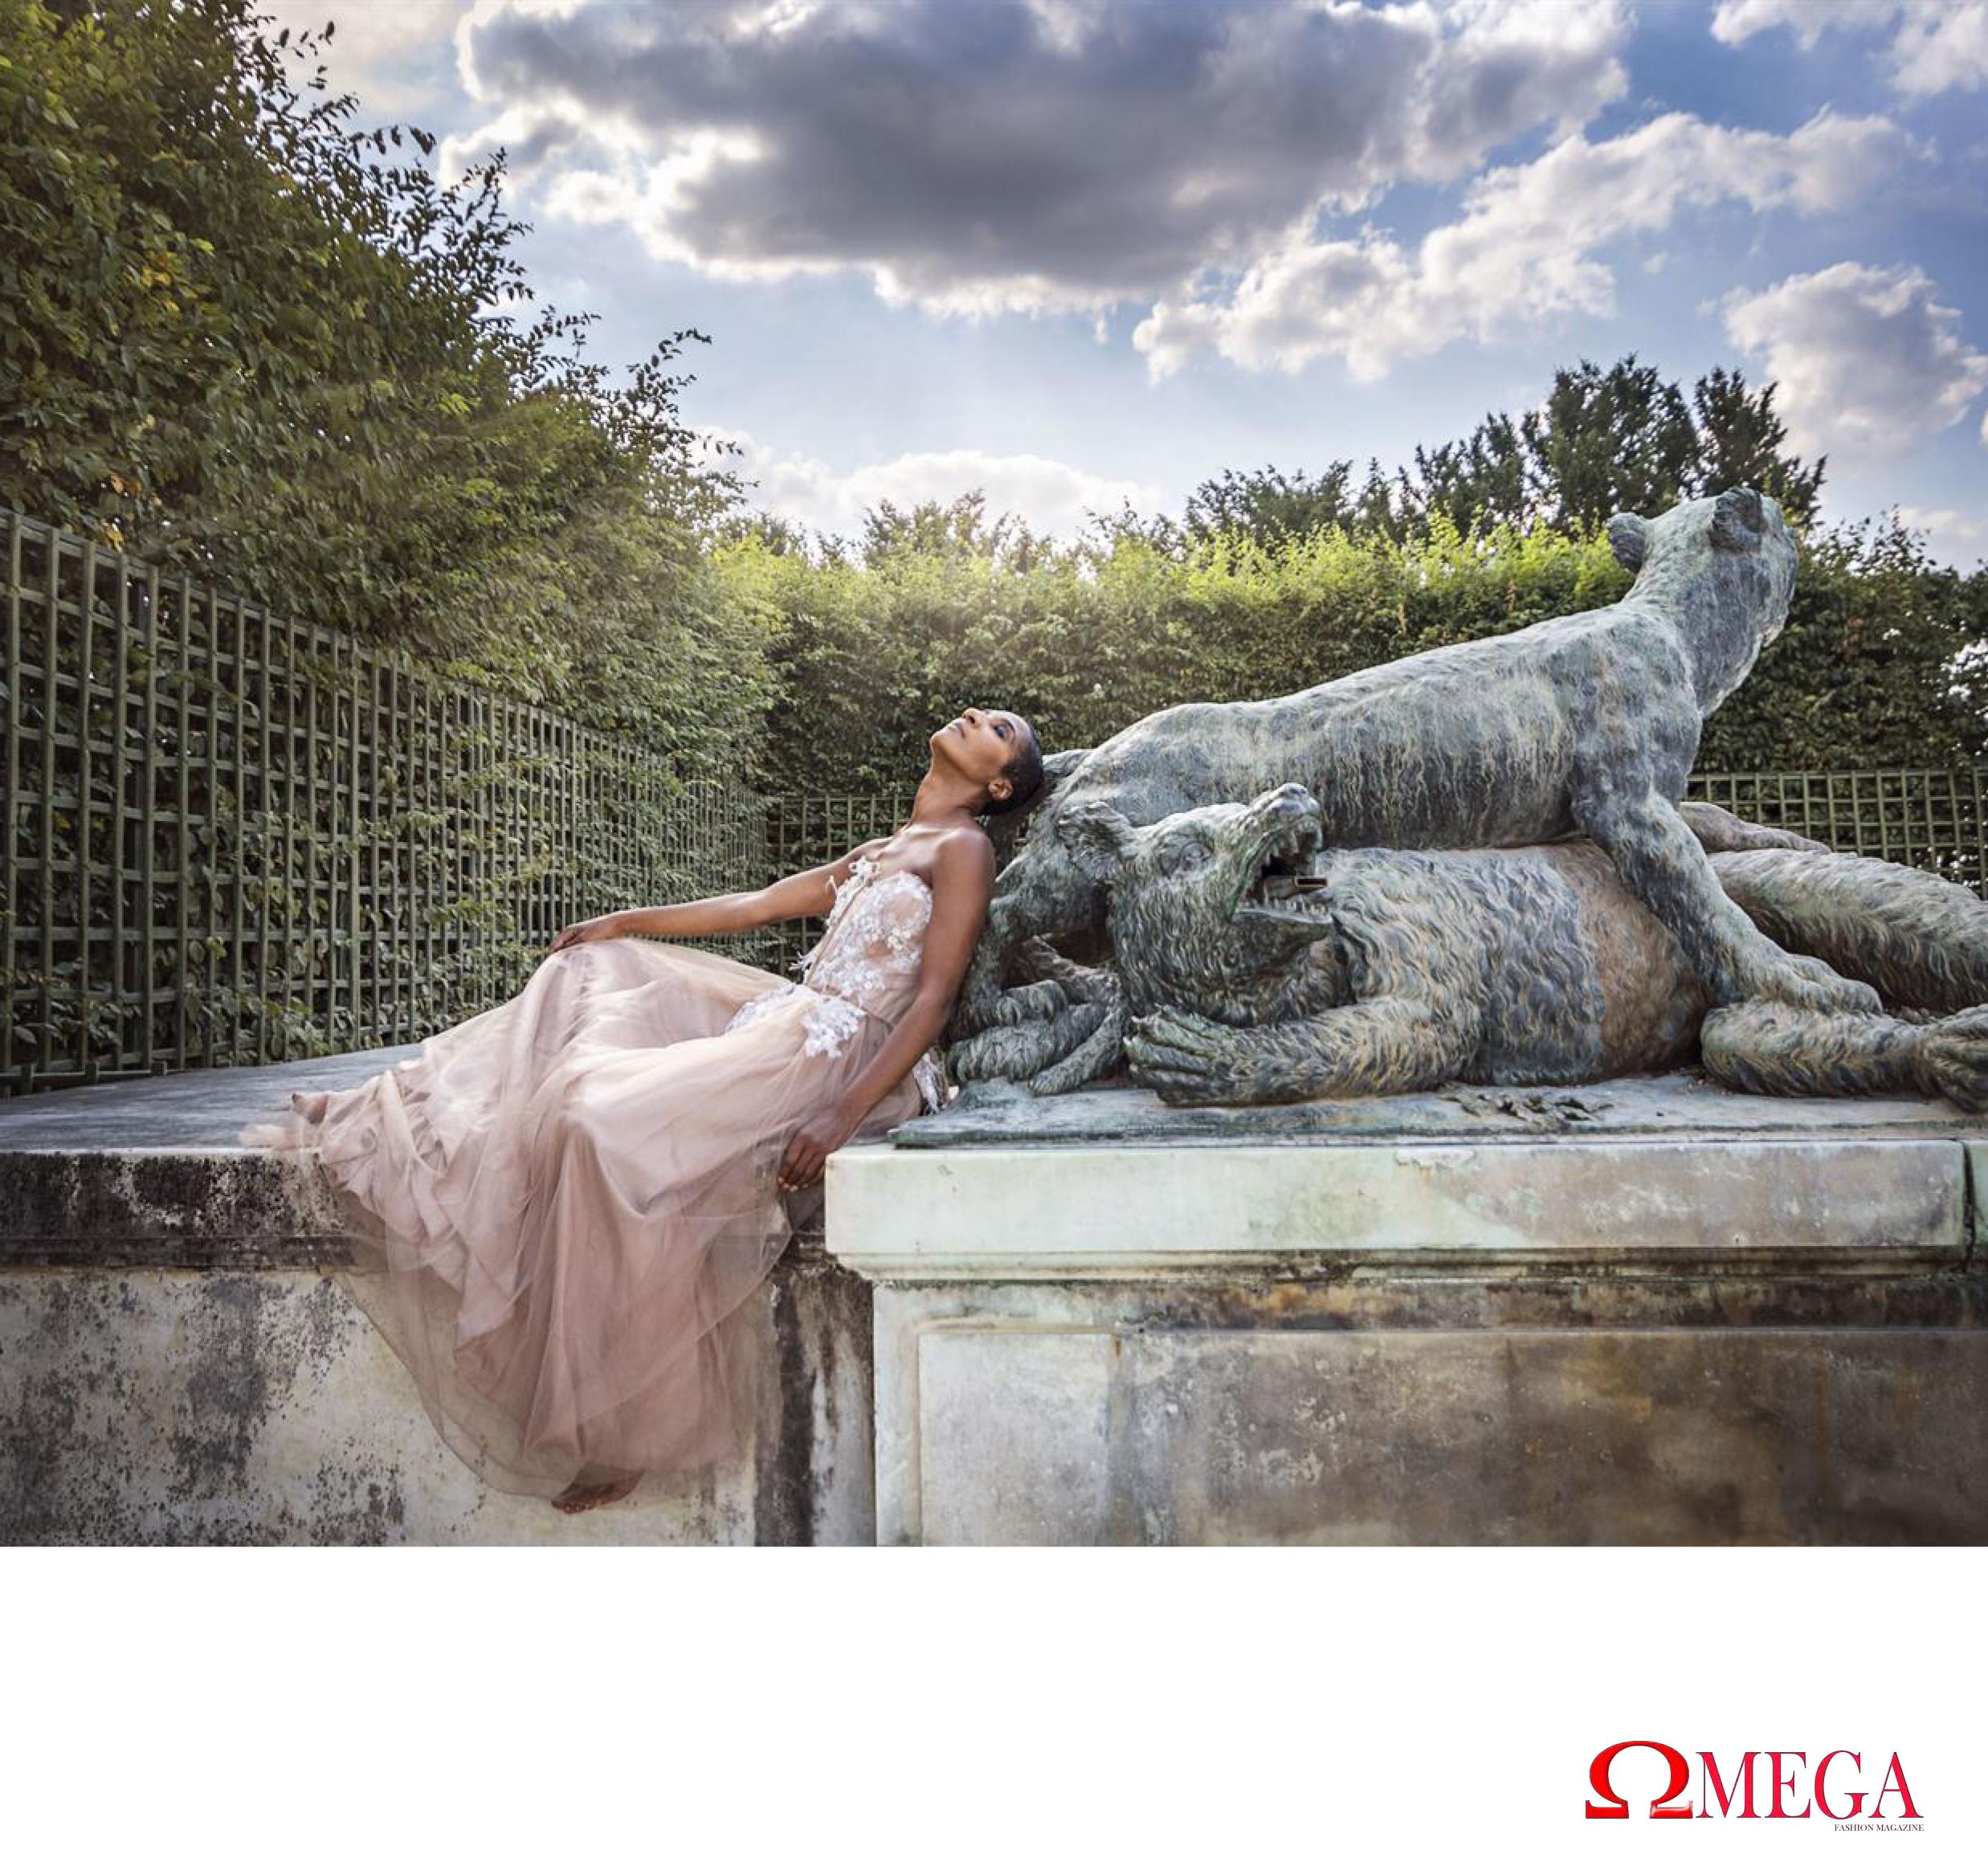 Omega_Fashion_Magazine_ 9 page 81.jpg